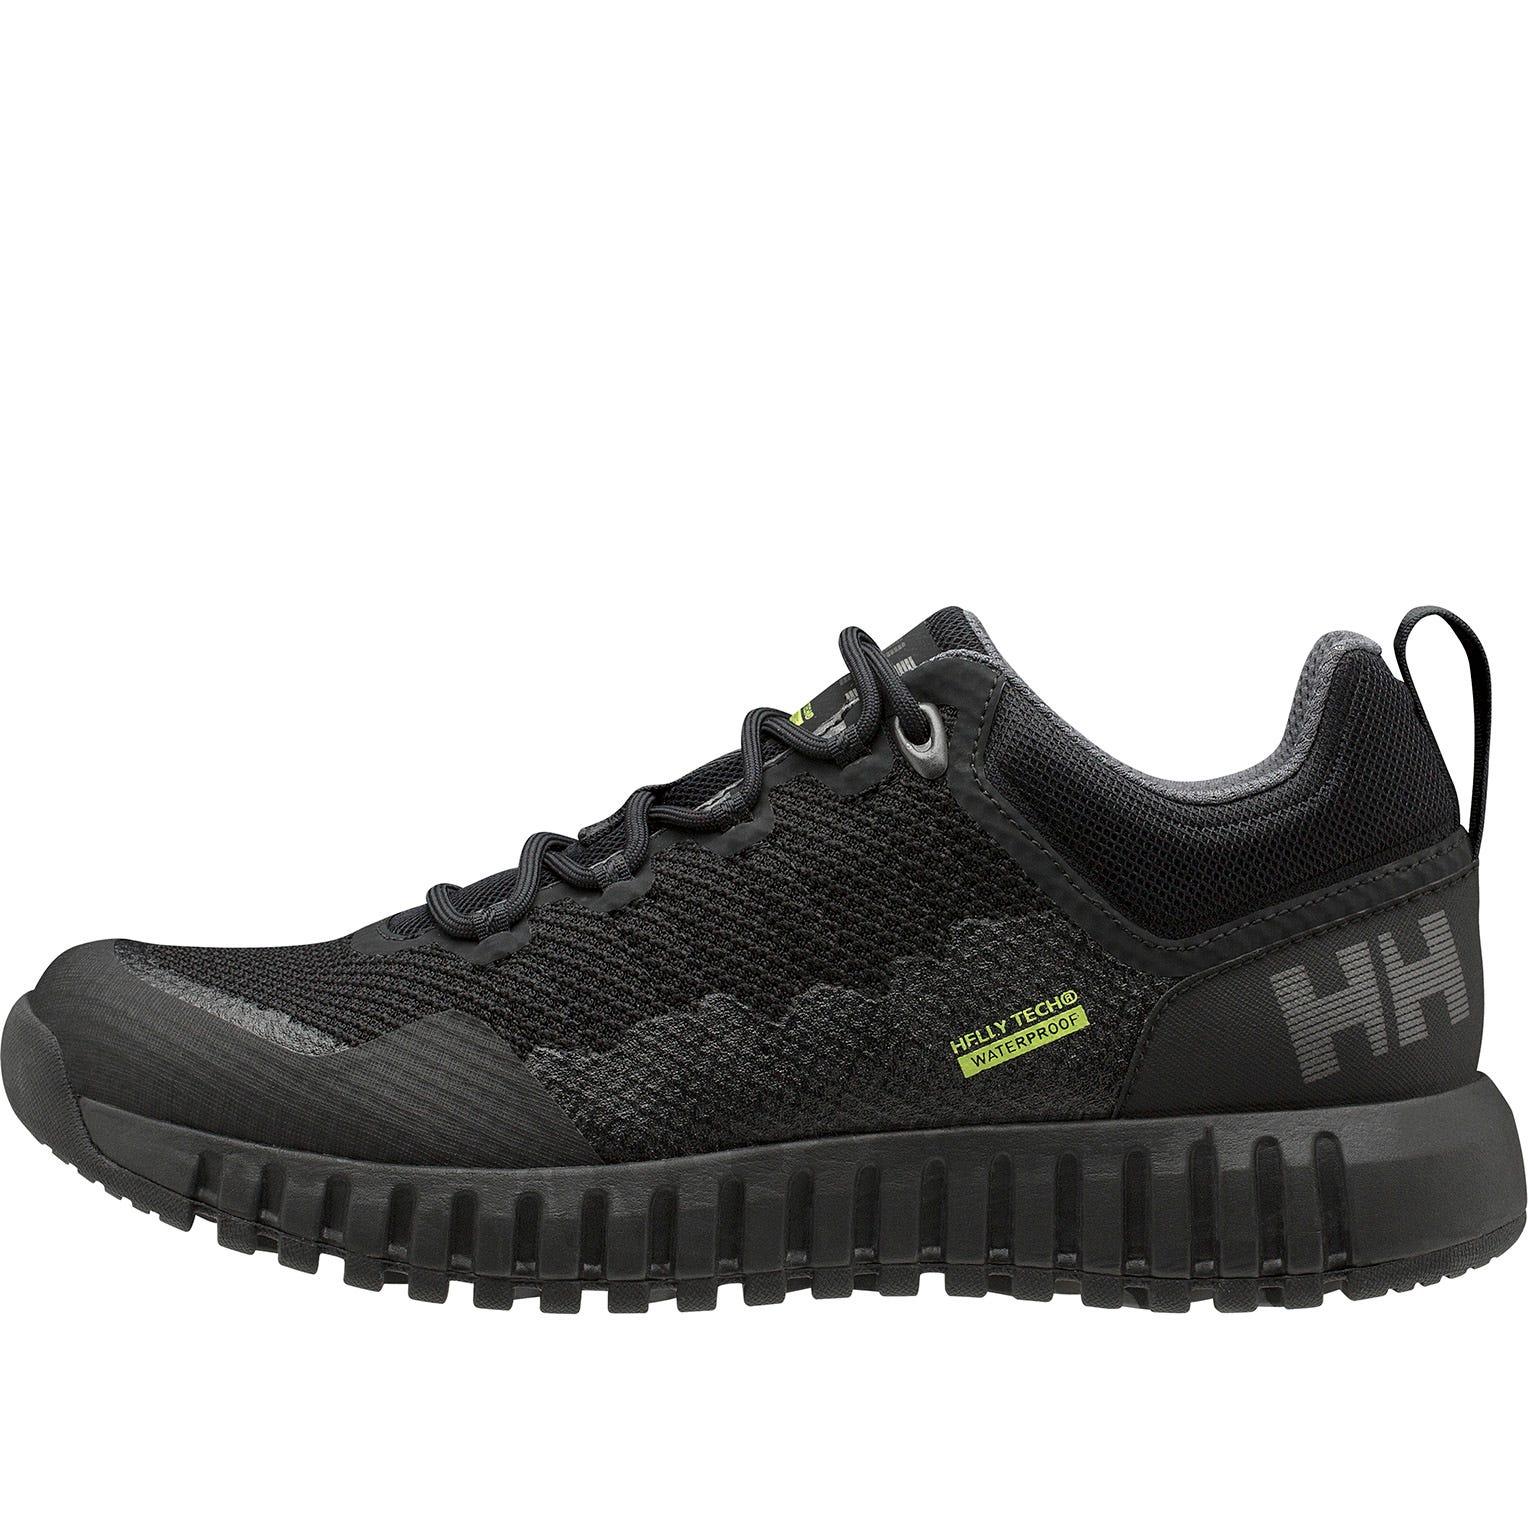 Helly Hansen Vanir Hegira Ht Mens Hiking Boot Black 41/8